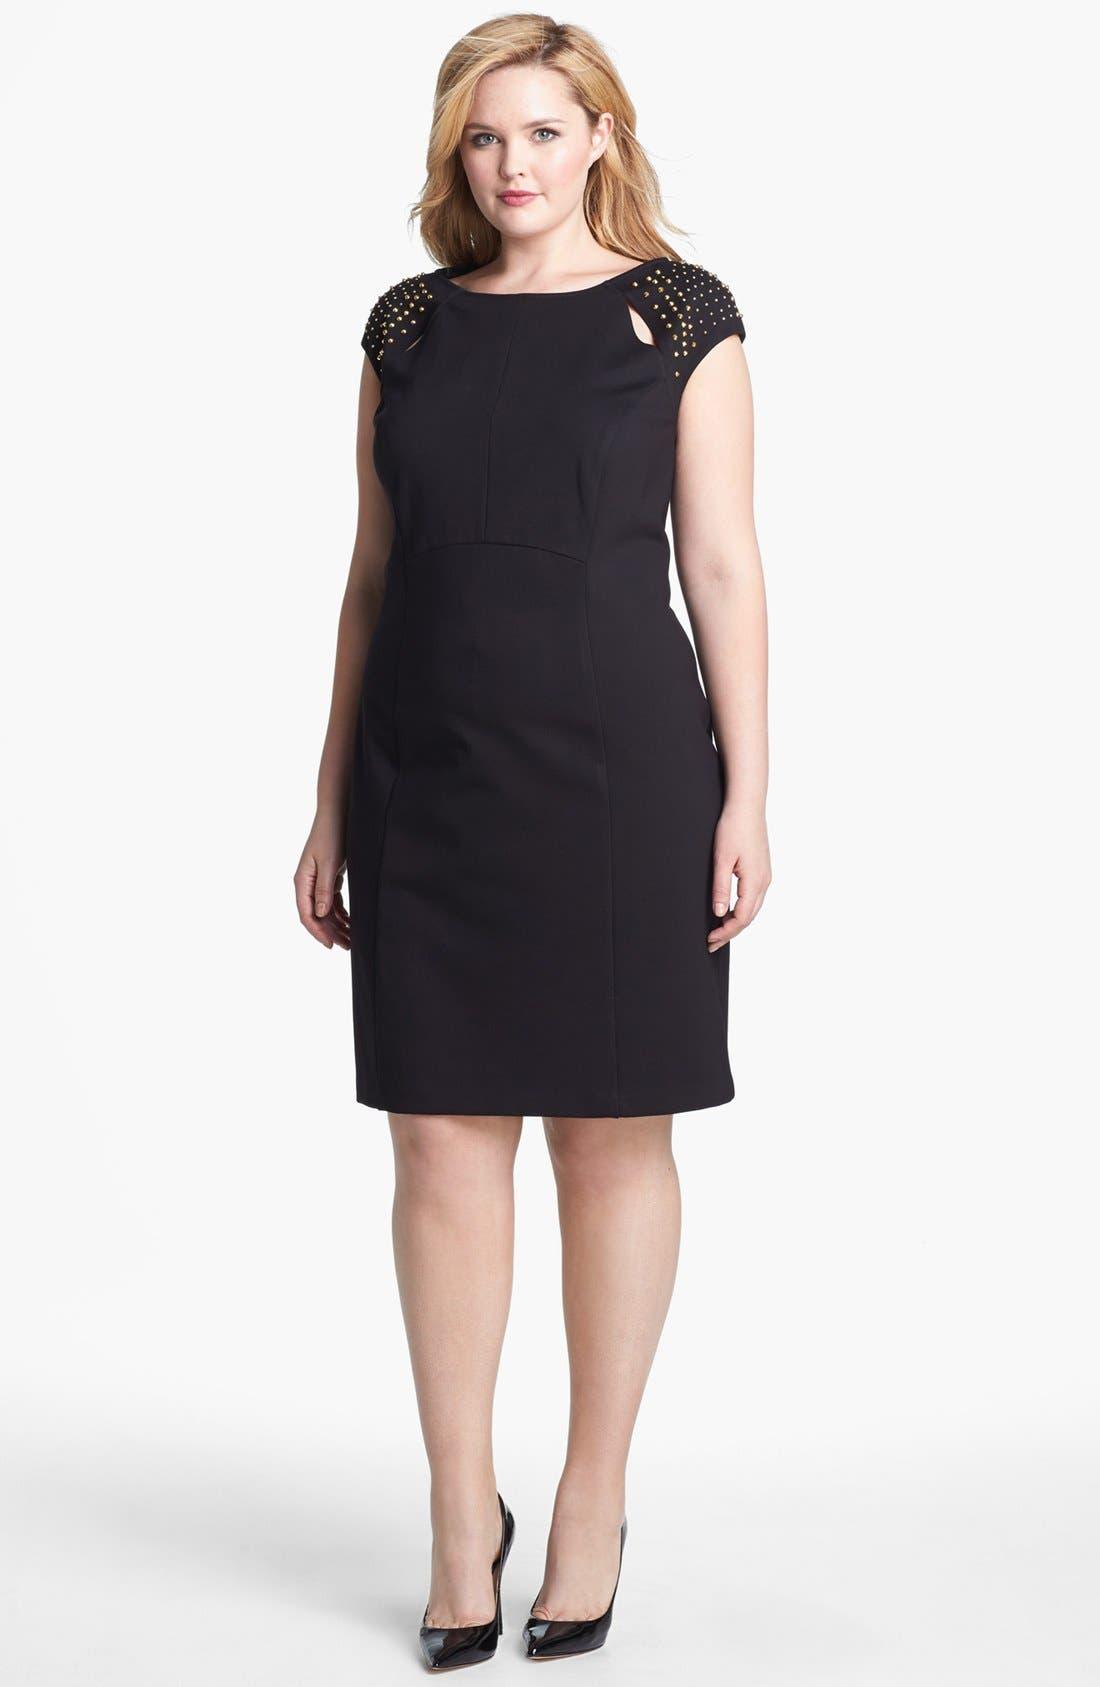 Main Image - ABS by Allen Schwartz Studded Sheath Dress (Plus Size)